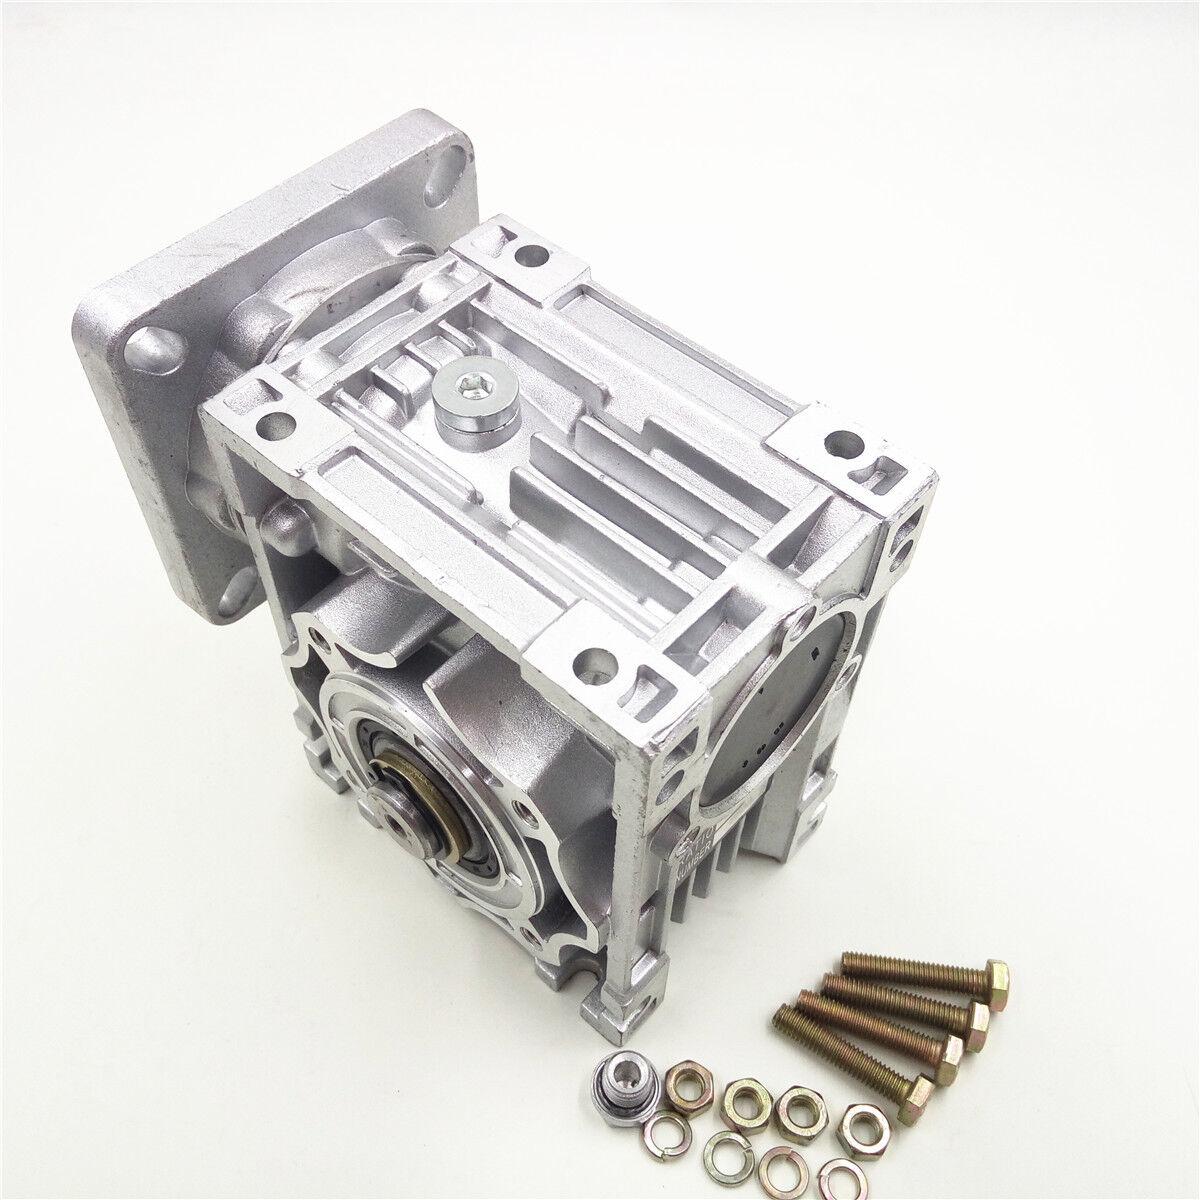 Nema34 Worm Gearbox Geared Speed Reducer 14mm Input Reduction for Stepper Motor 3